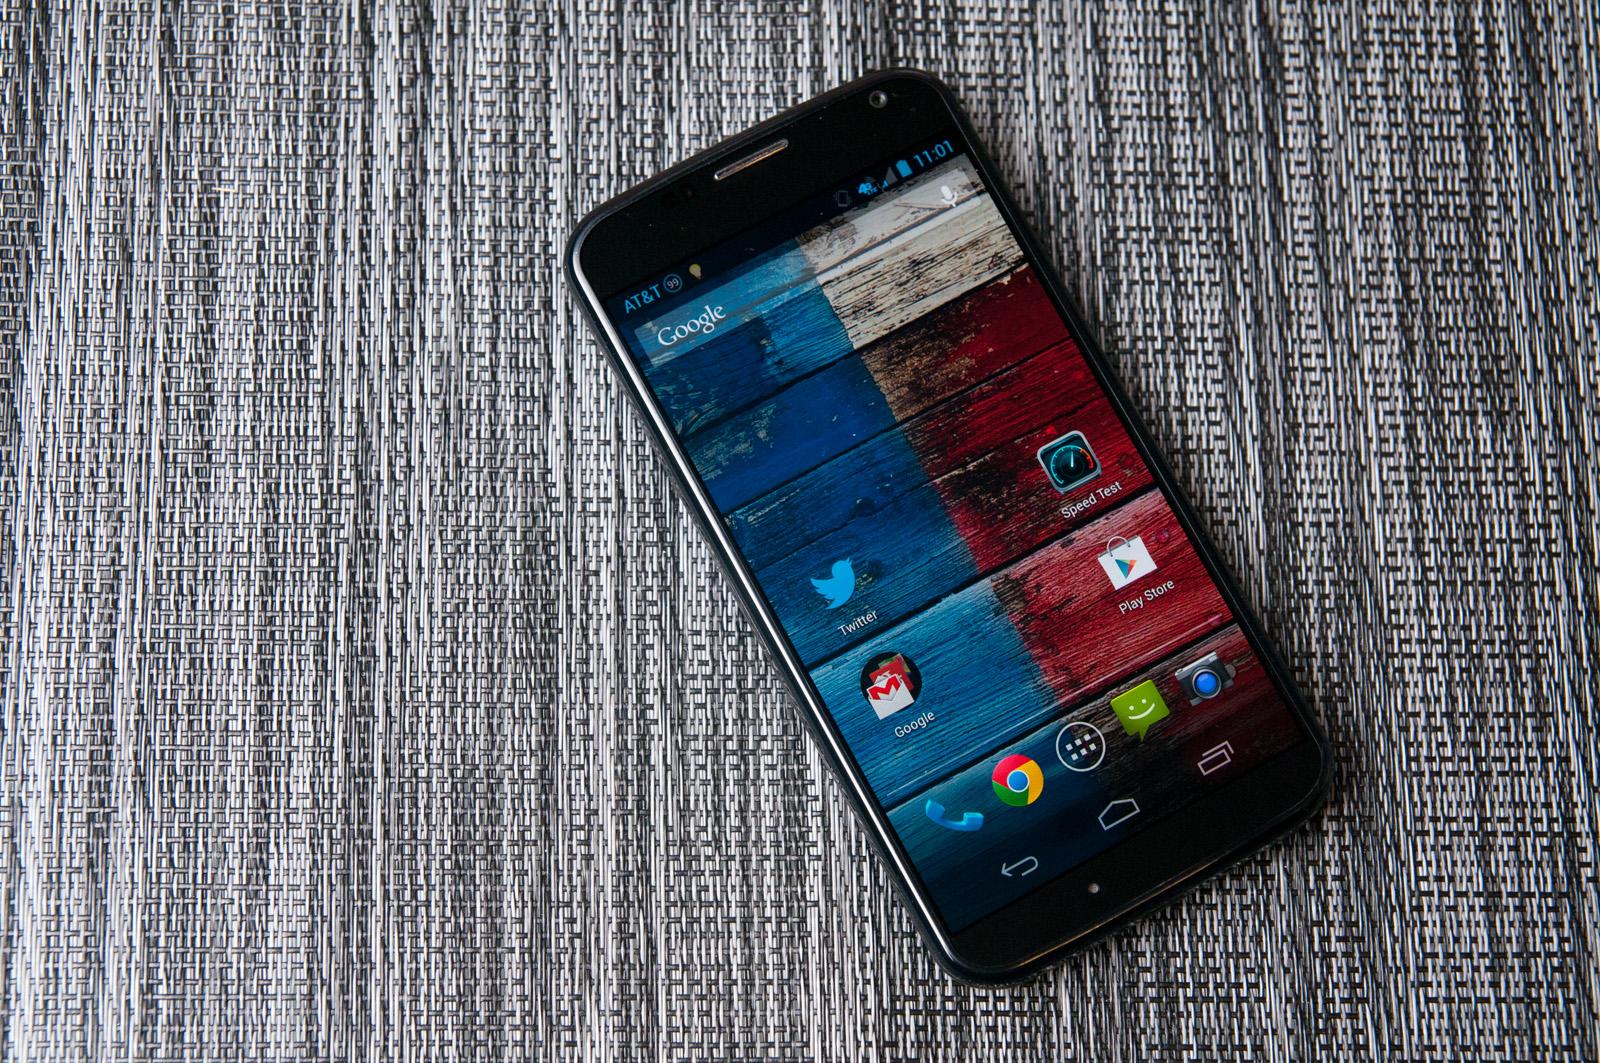 Display & Sound - Moto X Review